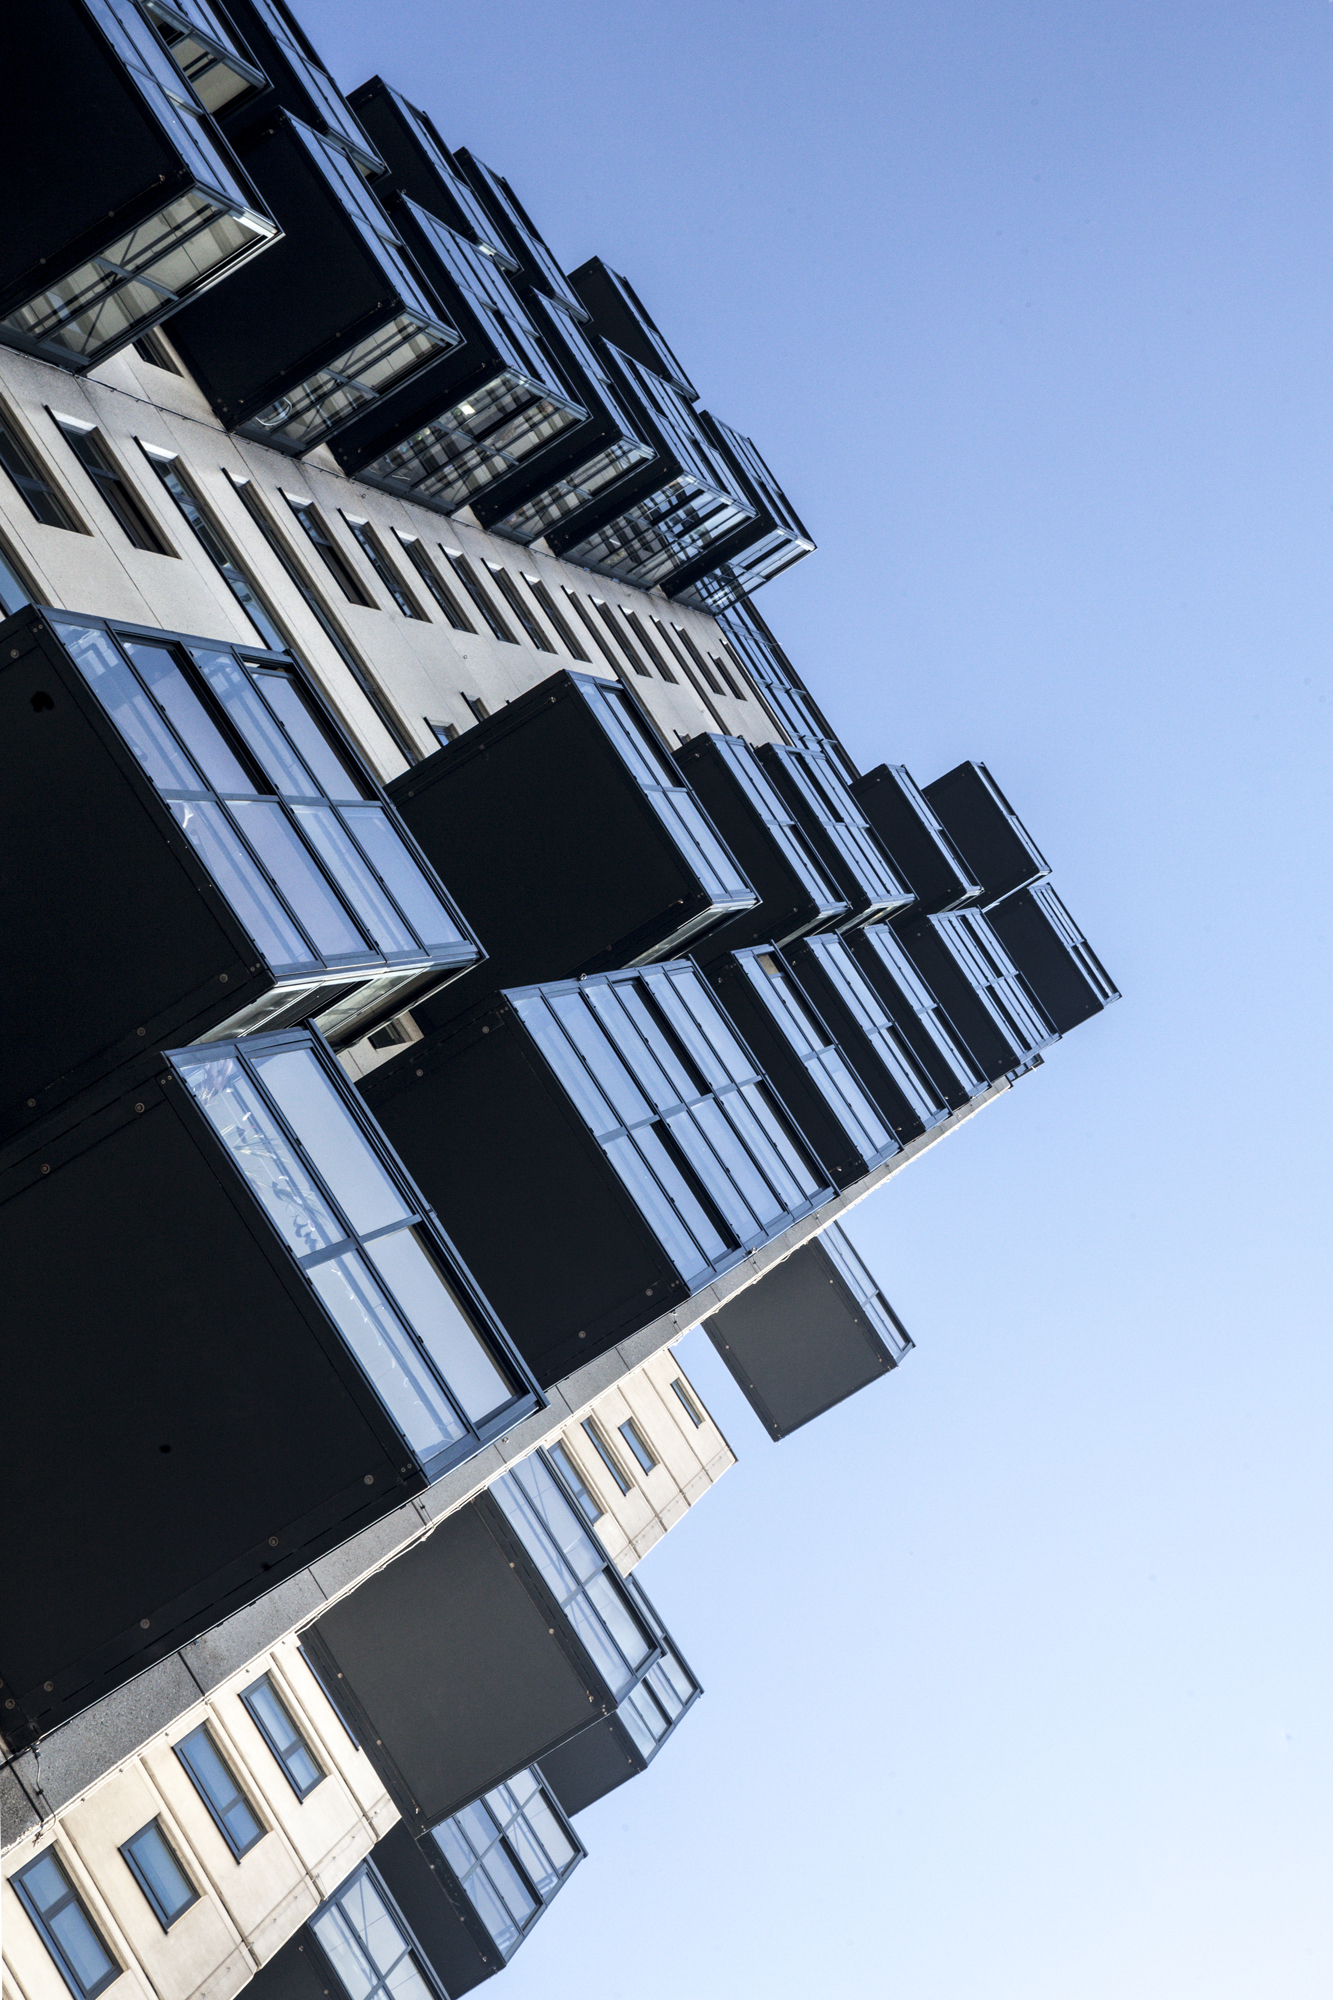 Stadsheer, Tilburg, Nederland, Architecture,